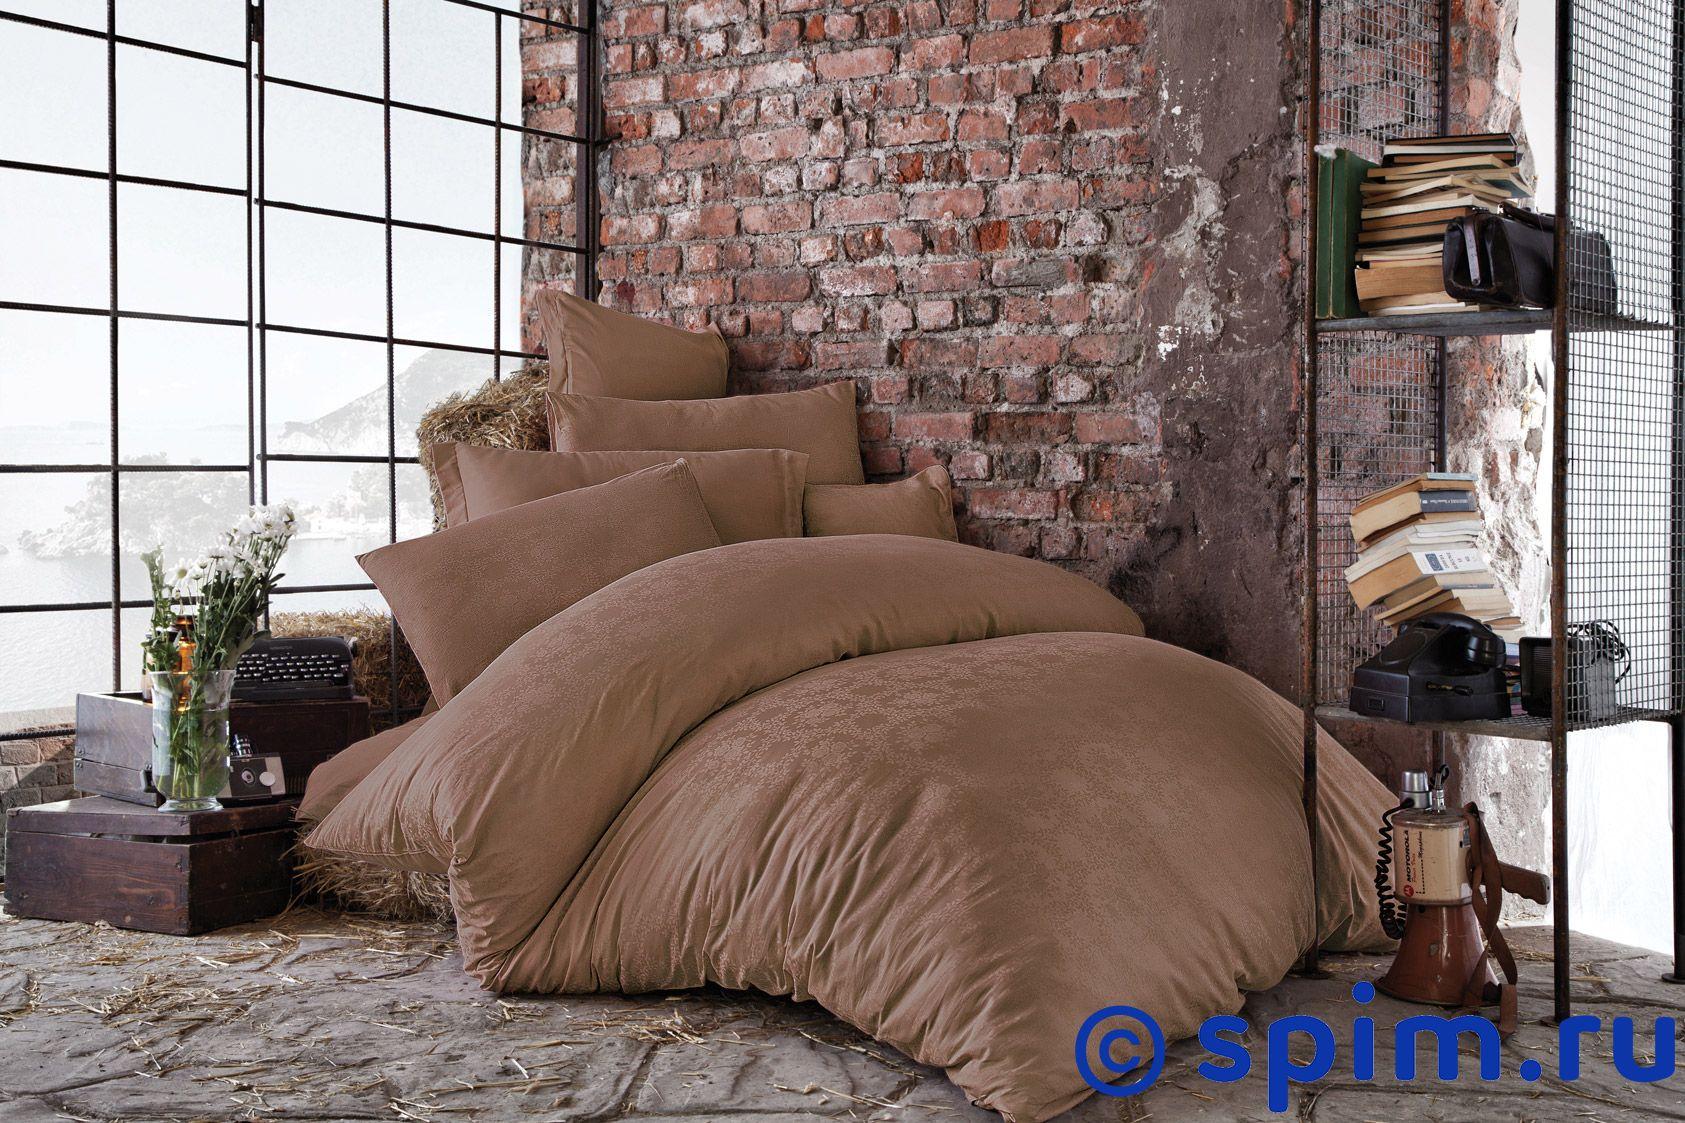 Постельное белье Issimo Bertha Евро-стандарт